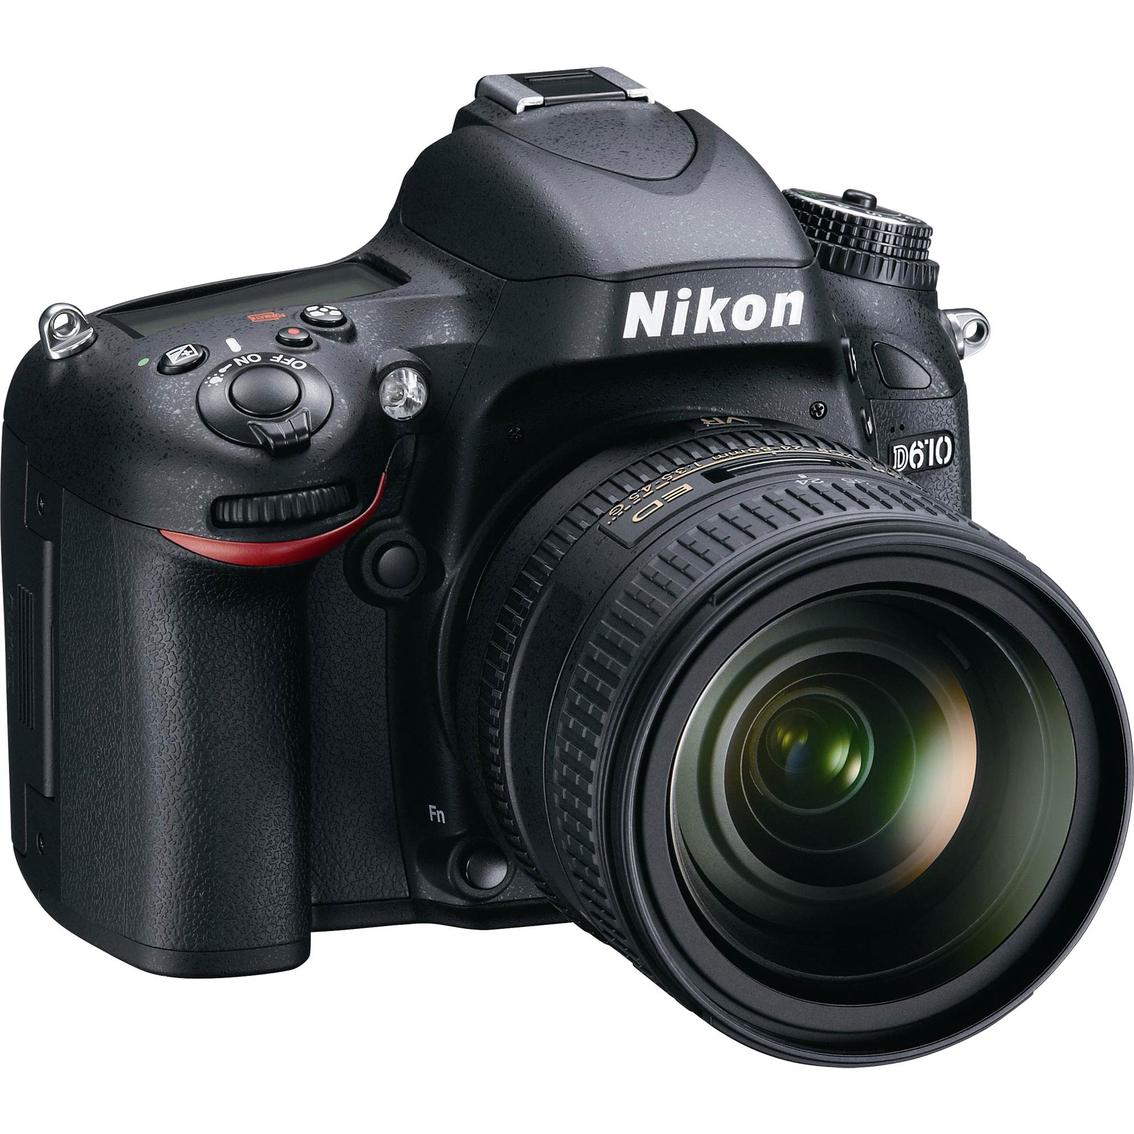 Camera Hd Dslr Cameras nikon d610 24 13mp hd dslr camera with 85mm vr lens lens